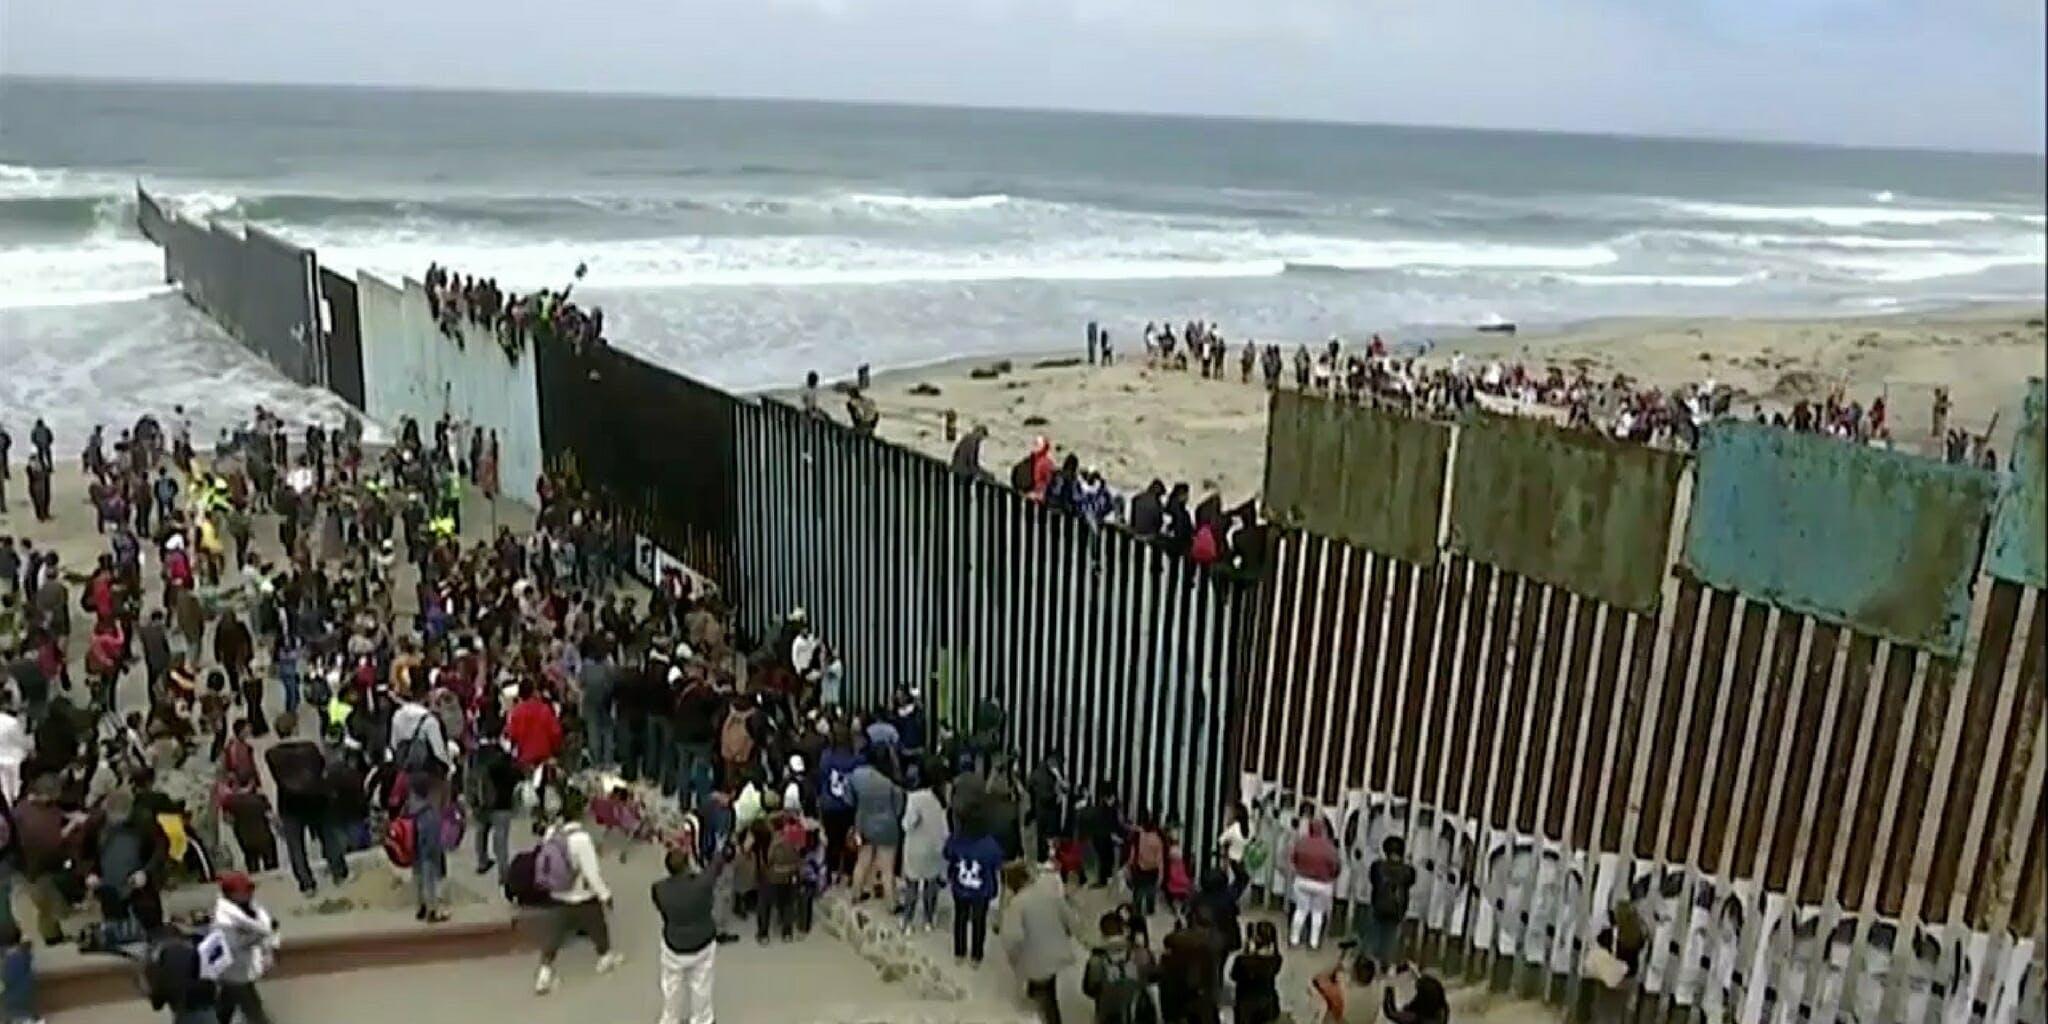 ICE immigration news